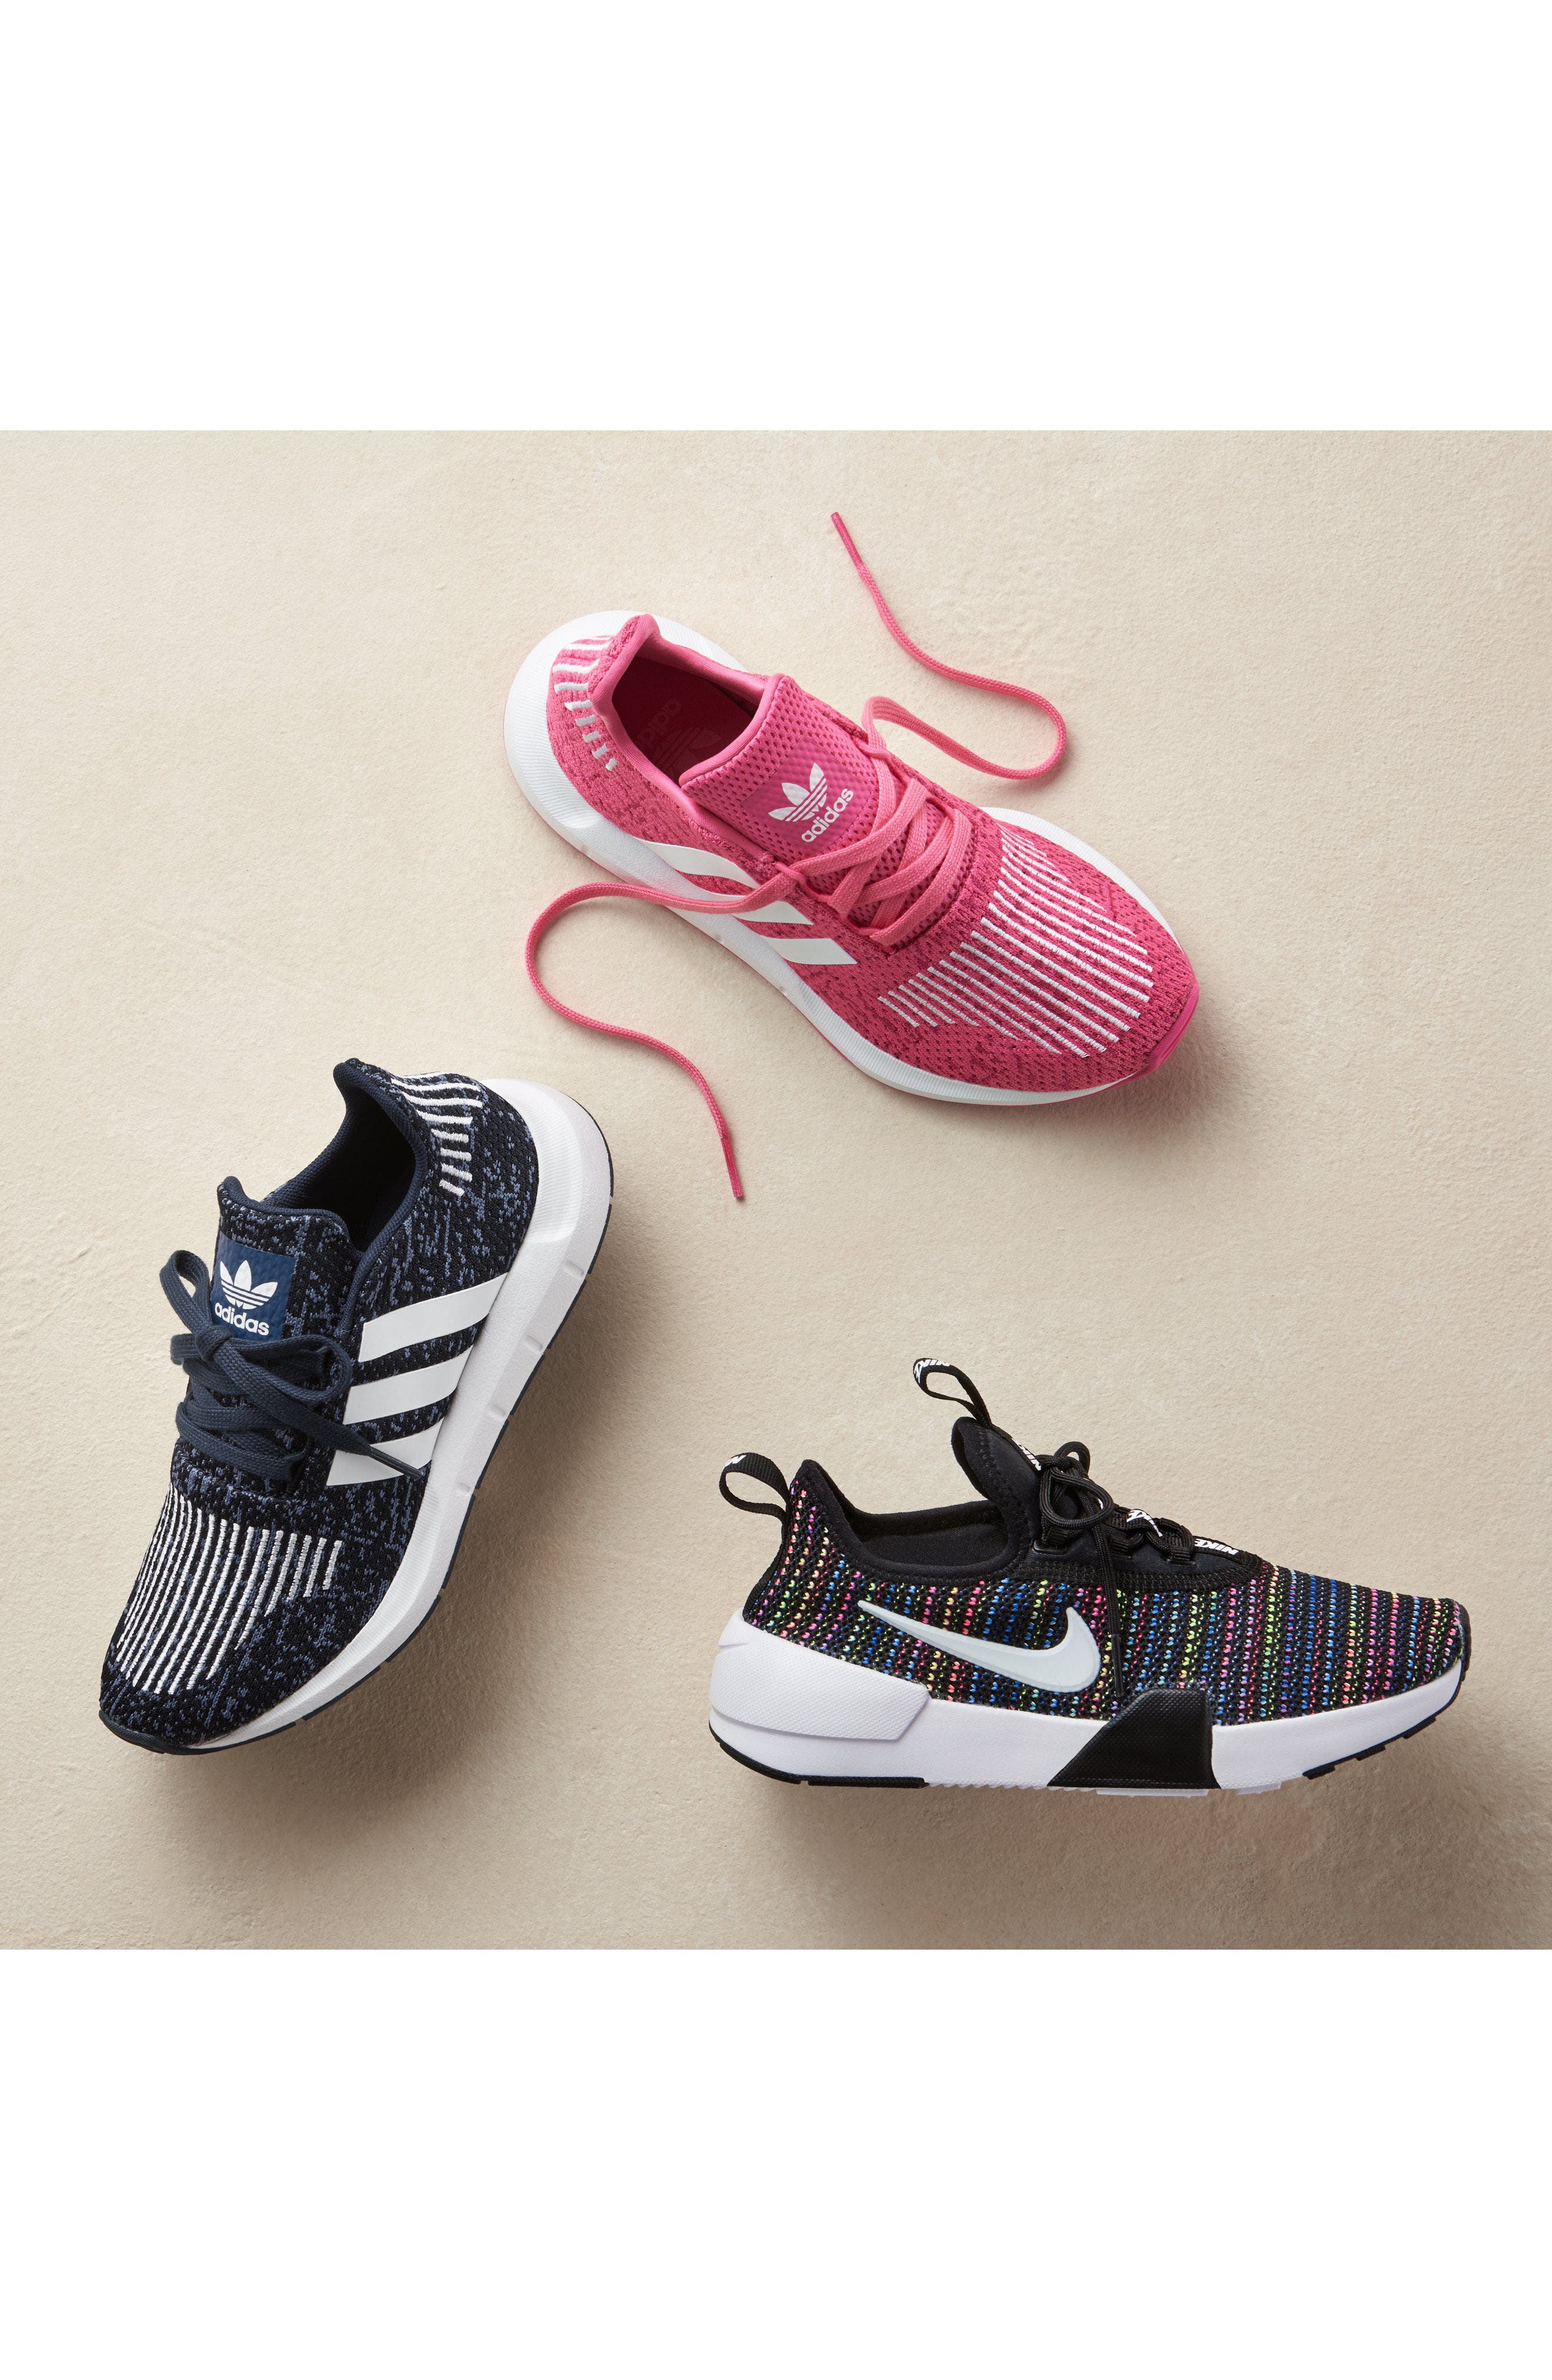 Swift Run J Sneaker,                             Alternate thumbnail 16, color,                             SEMI SOLAR PINK/ WHITE